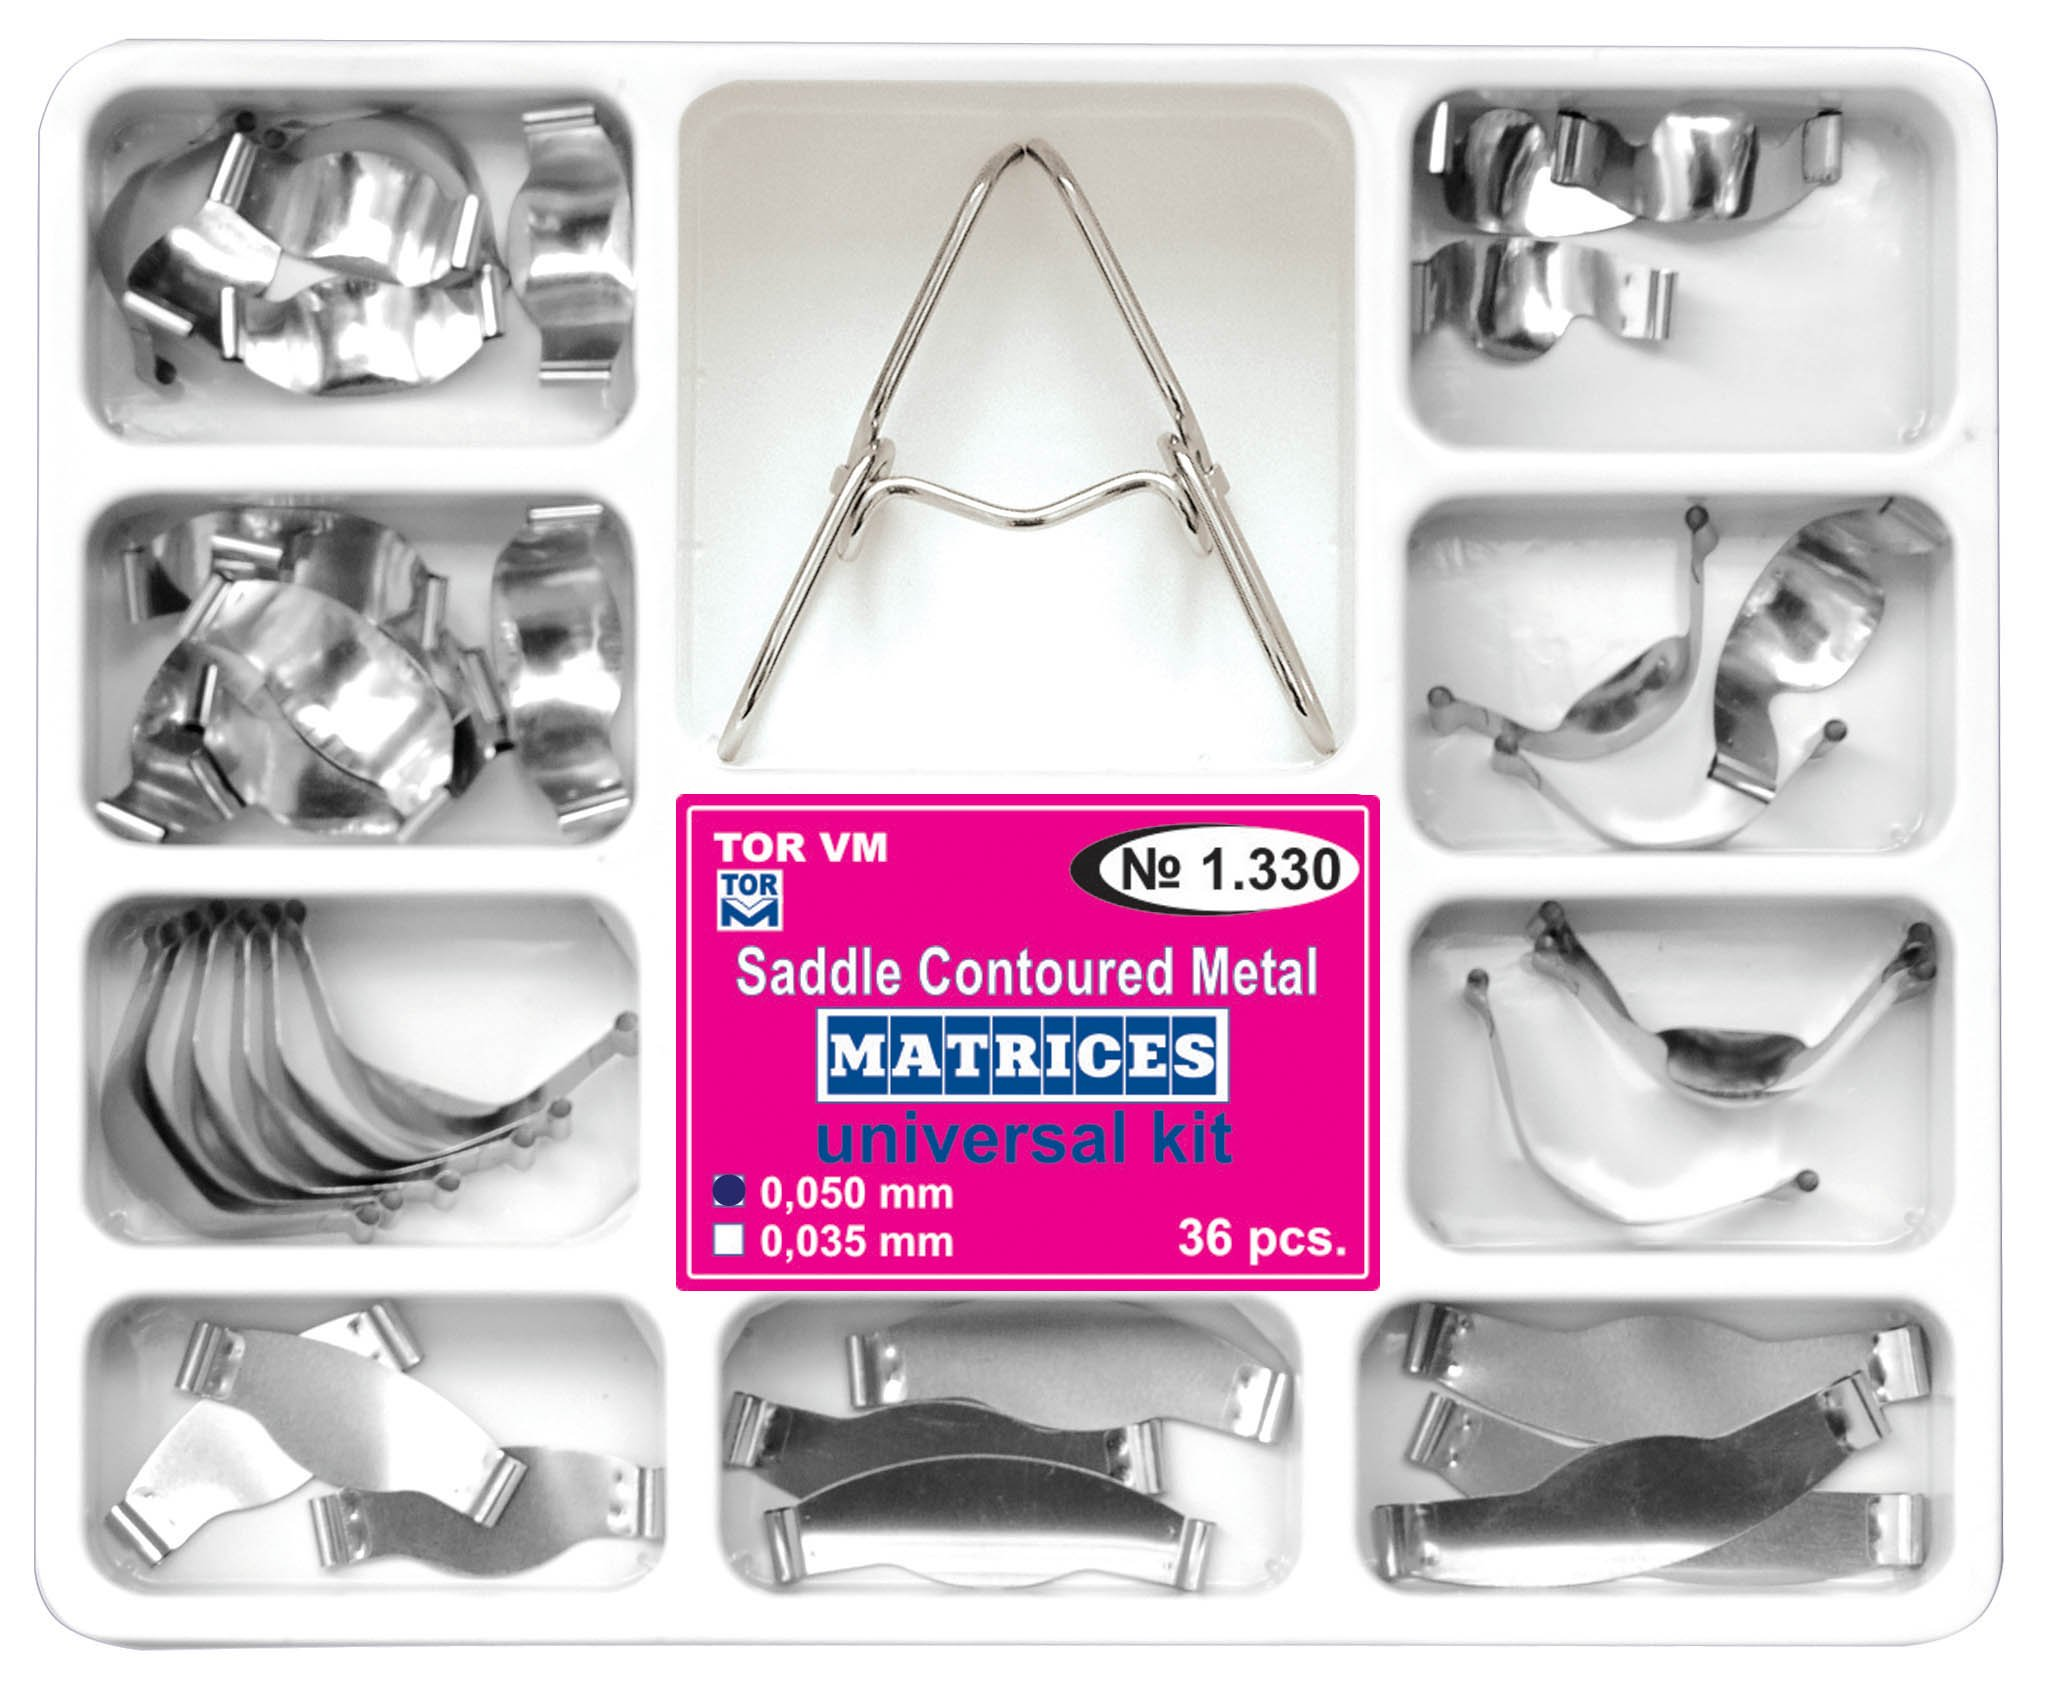 Dental Saddle Contoured Metal Matrices Matrix Universal Kit with Springclip 36 pcs/pack by Tor VM